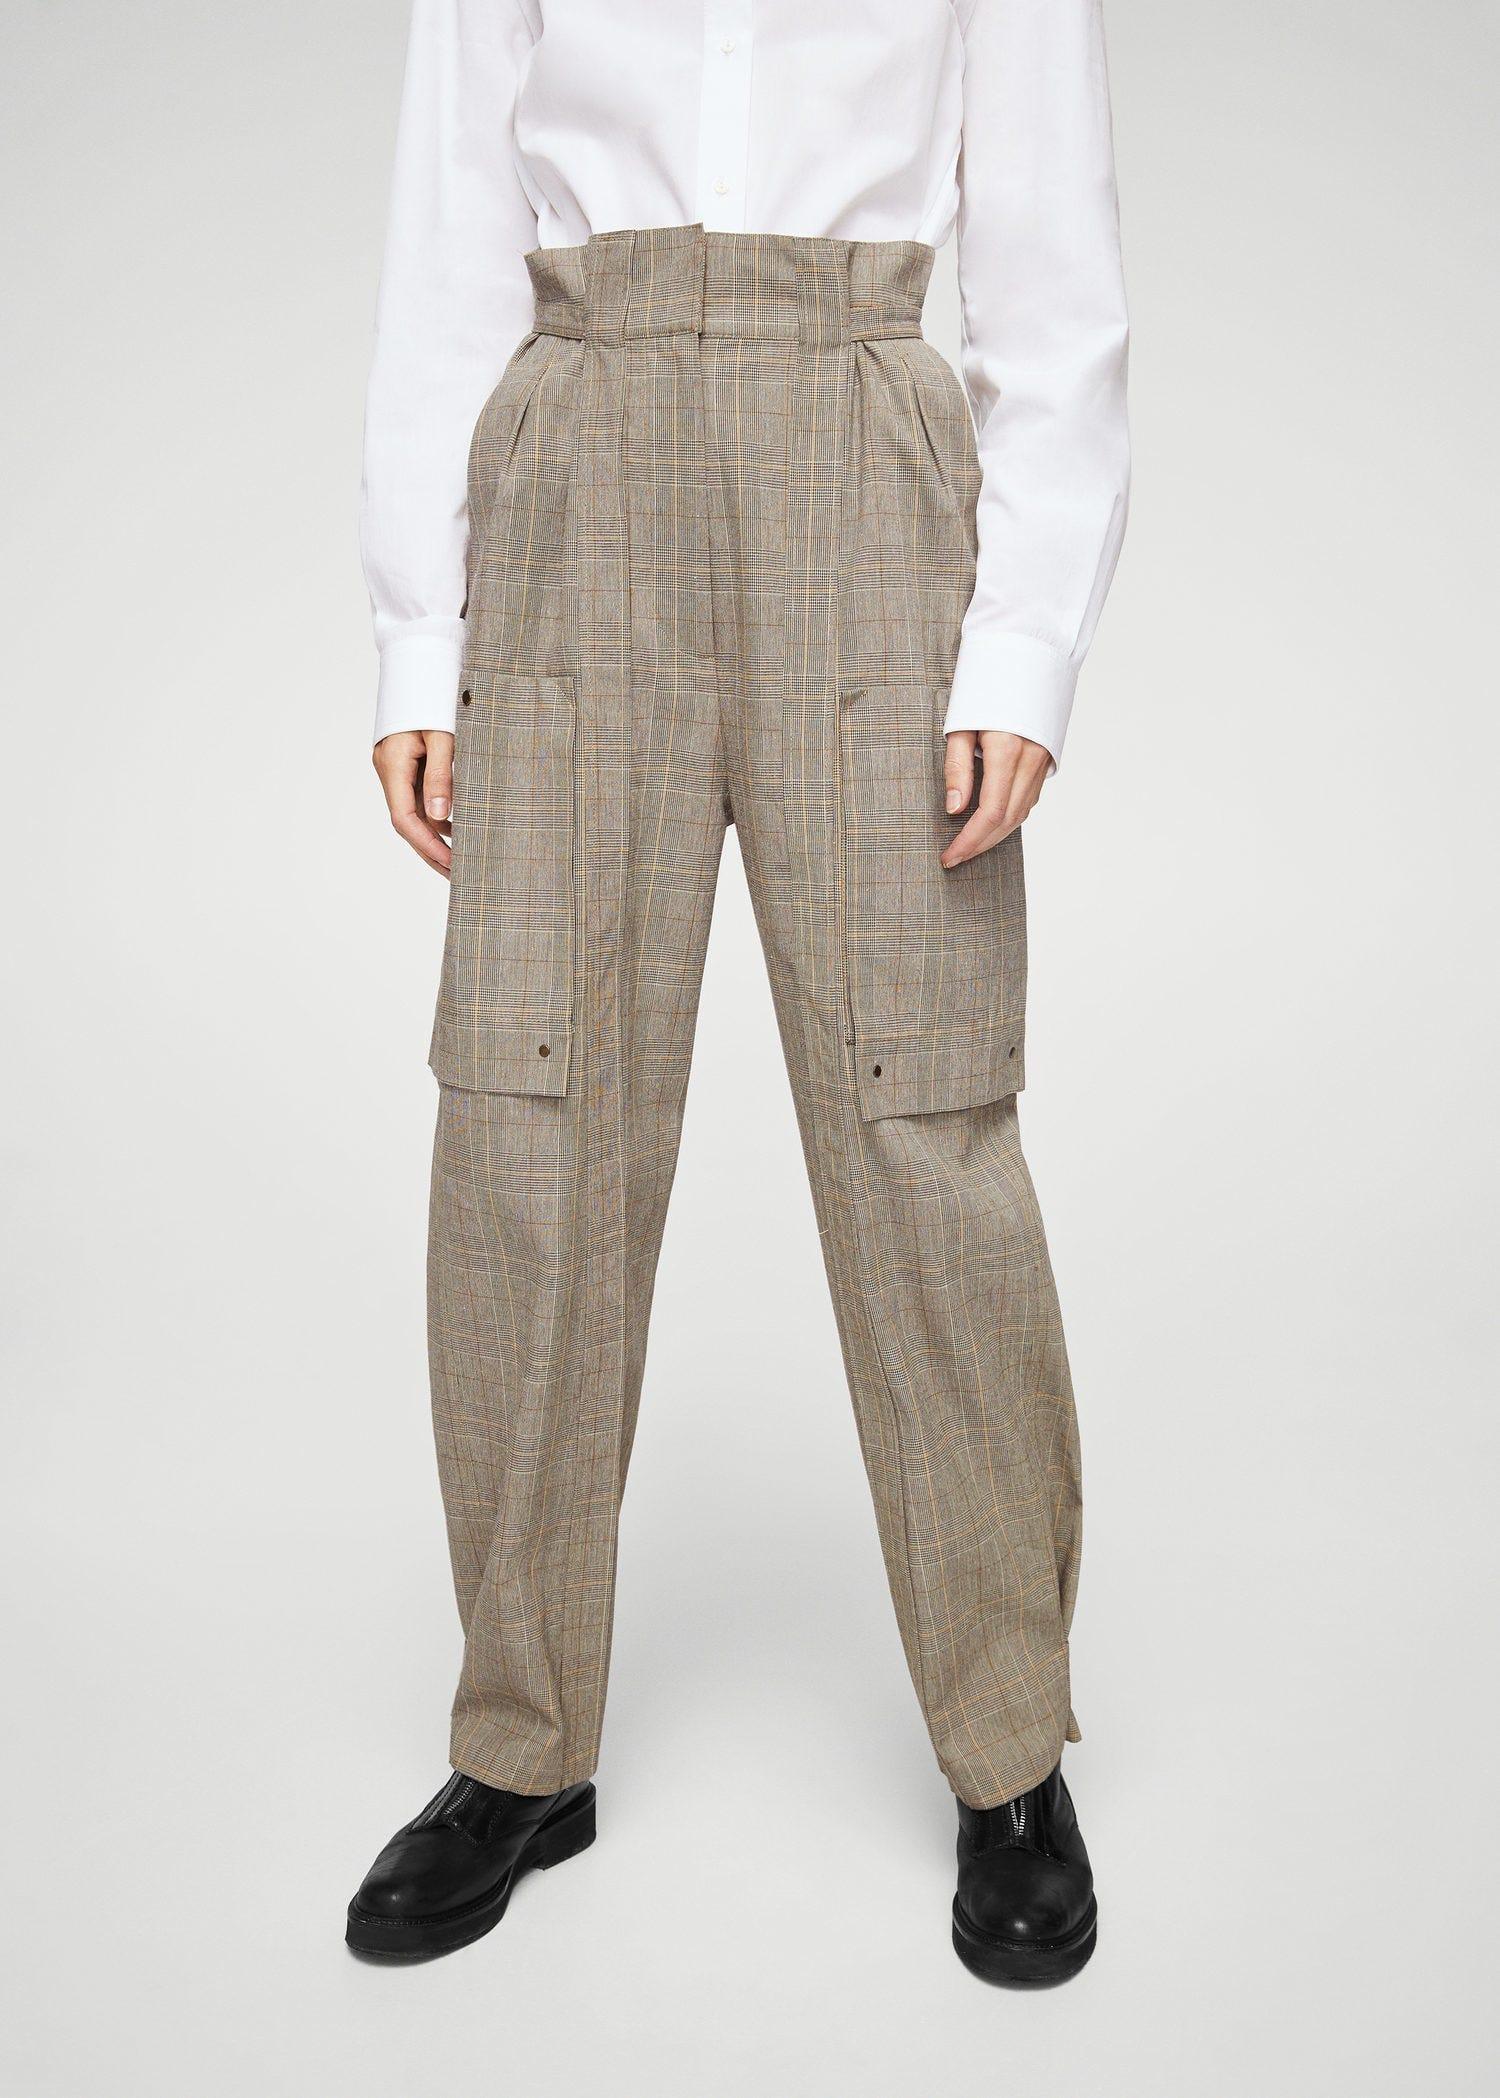 f9c779dd949d Cargo Pants Trends - Khakis